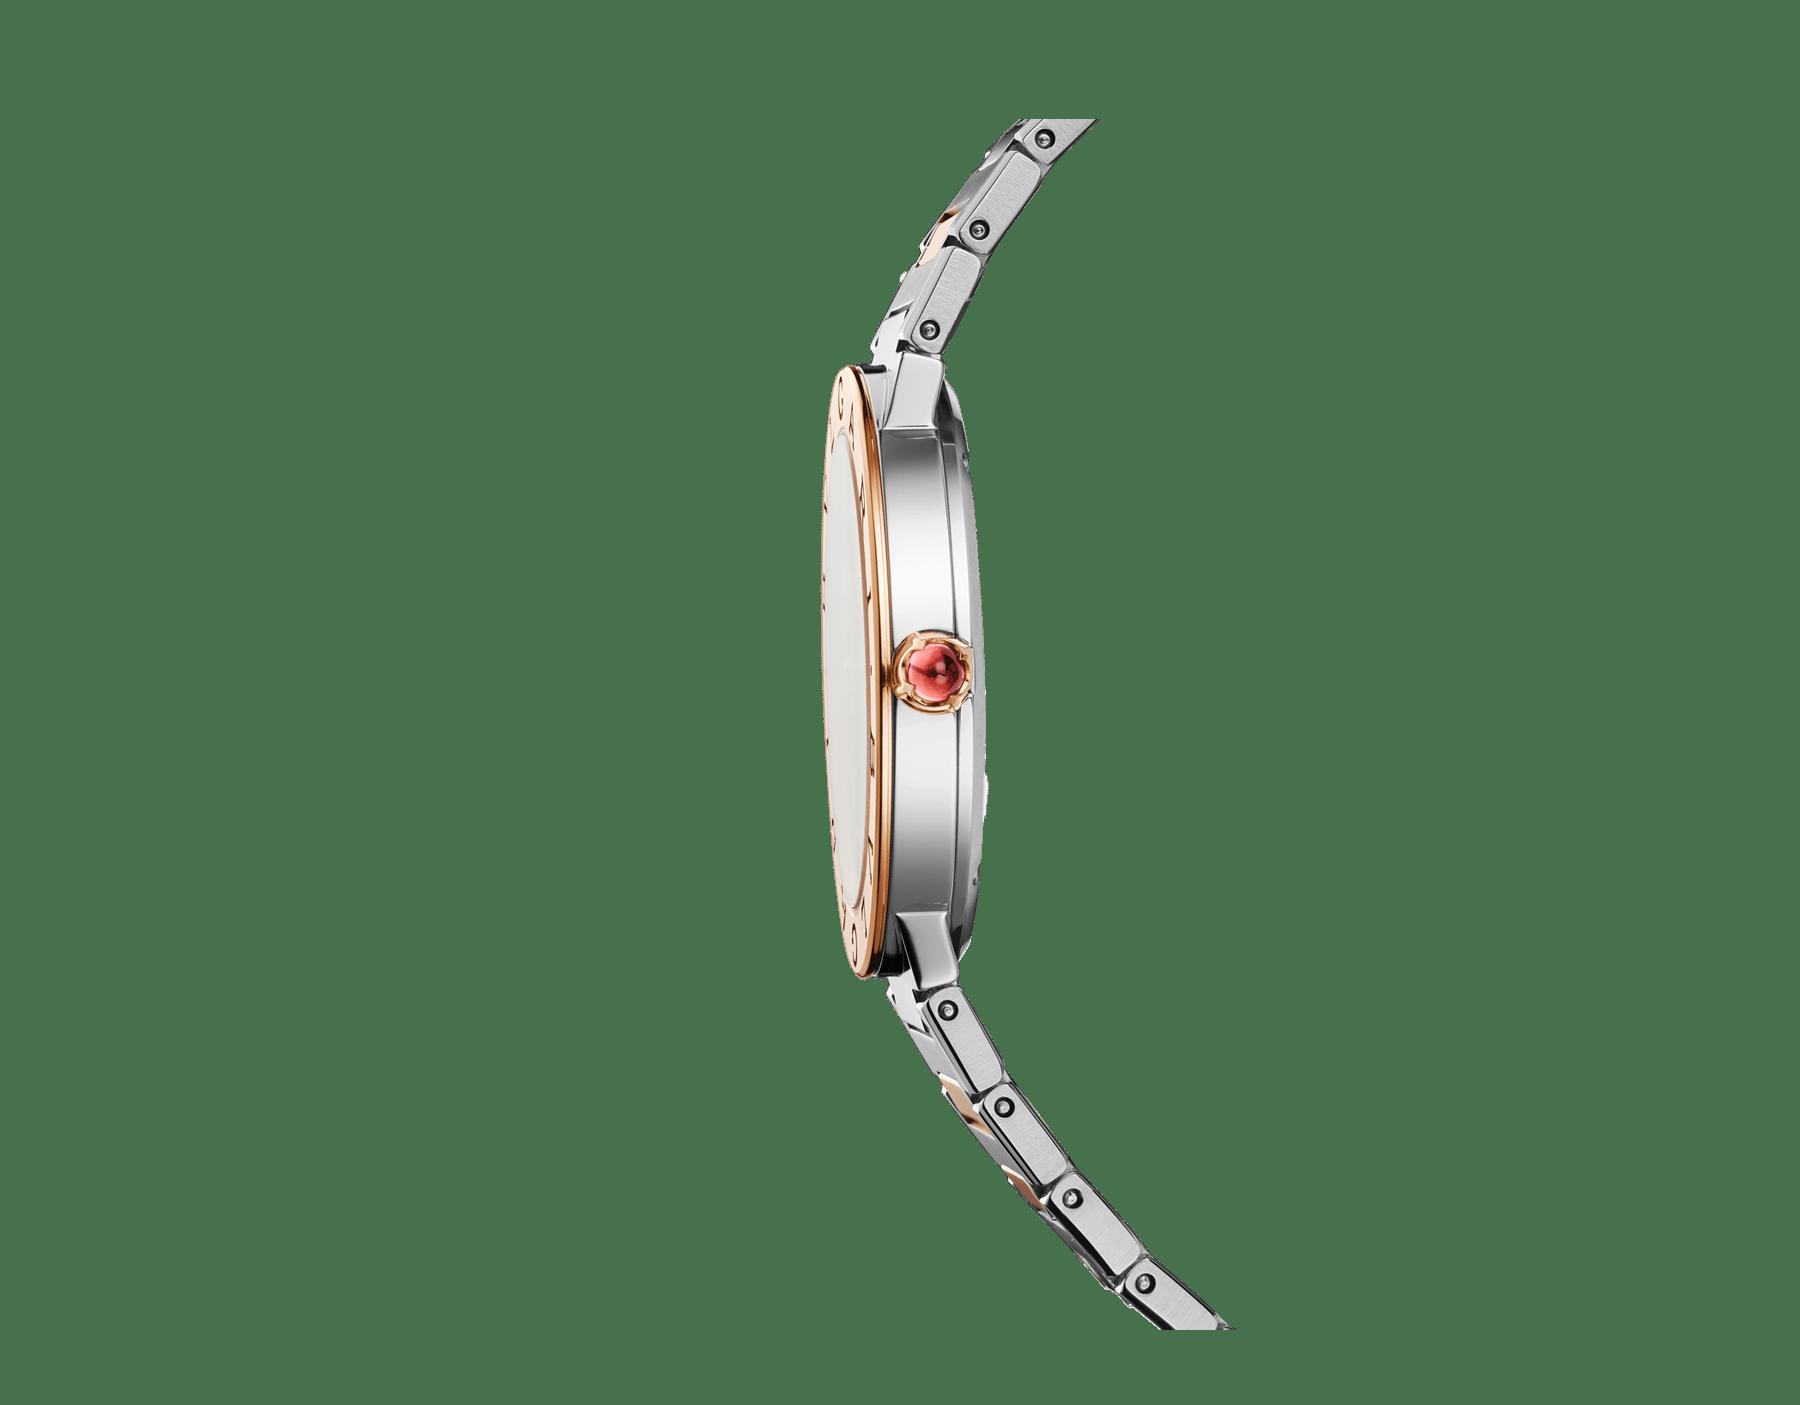 BVLGARI BVLGARI LADY腕表,精钢表壳,18K玫瑰金表圈镌刻双logo标志,白色珍珠母贝表盘,18K玫瑰金和精钢表链 102925 image 2